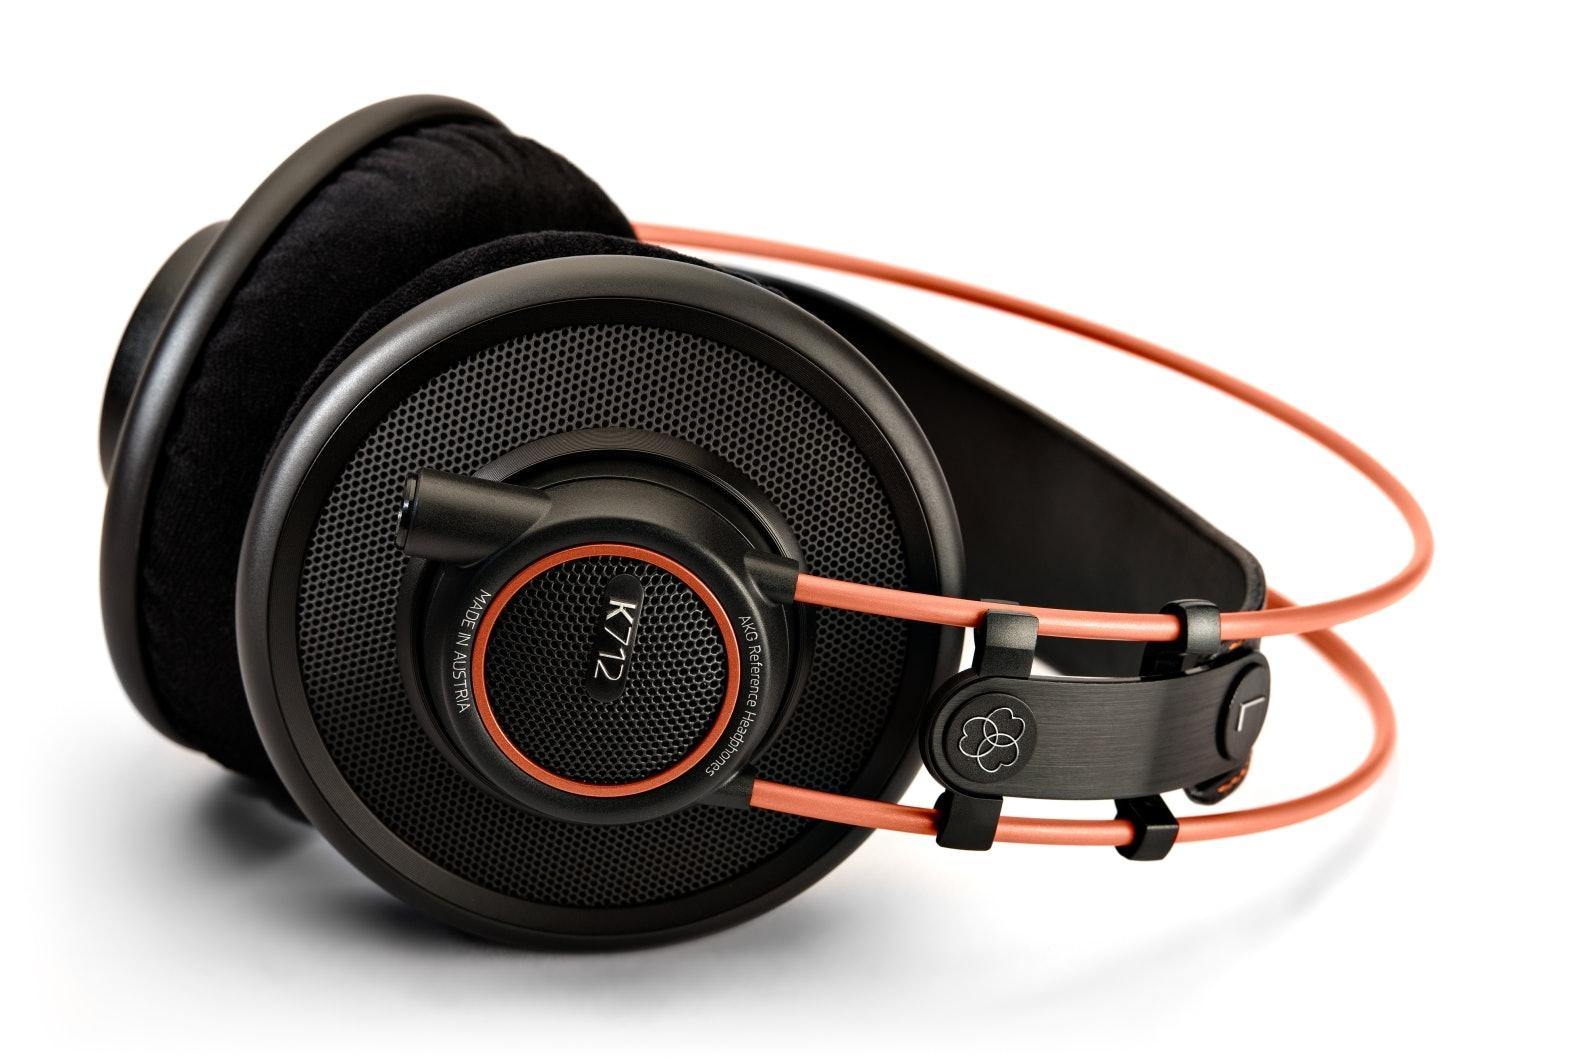 AKG K712 Pro Audiophile Headphones